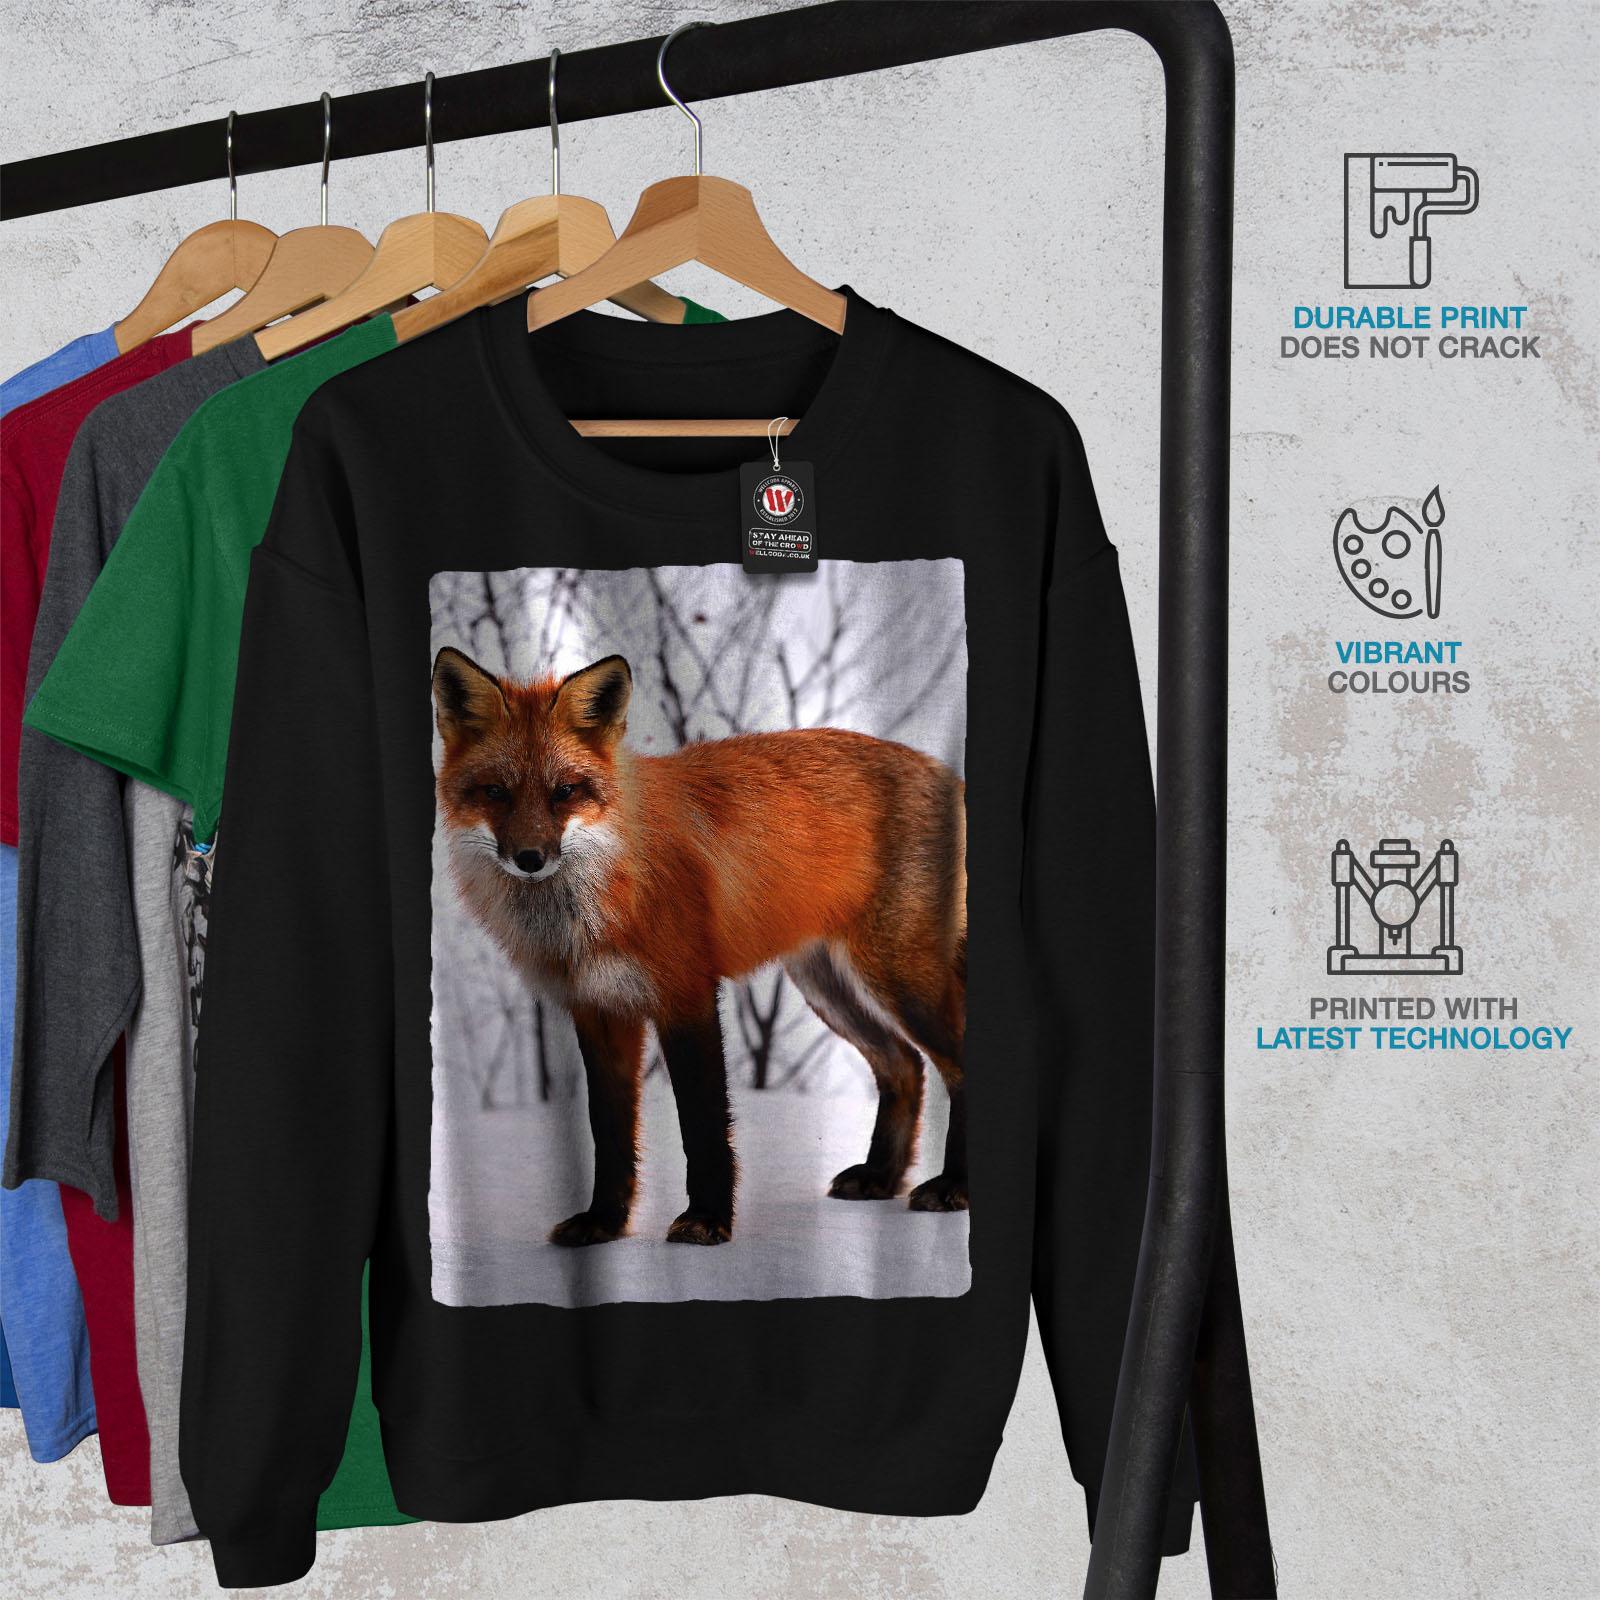 No Fox Beast Funny Animal Men Contrast Hoodie NEWWellcoda